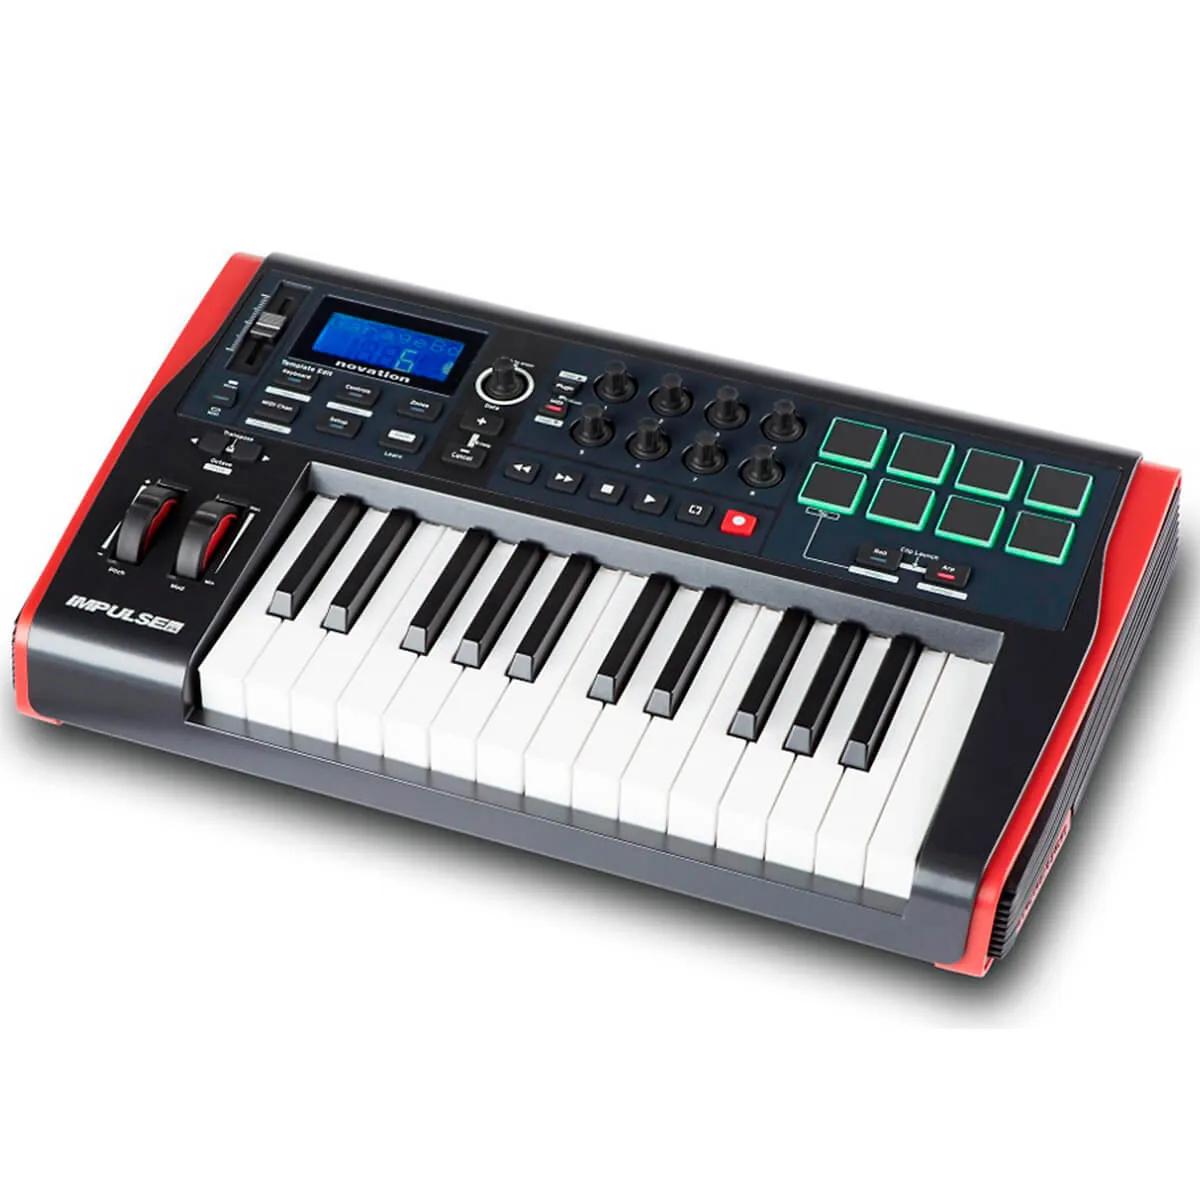 Teclado Controlador Novation Impulse 25 USB / MIDI